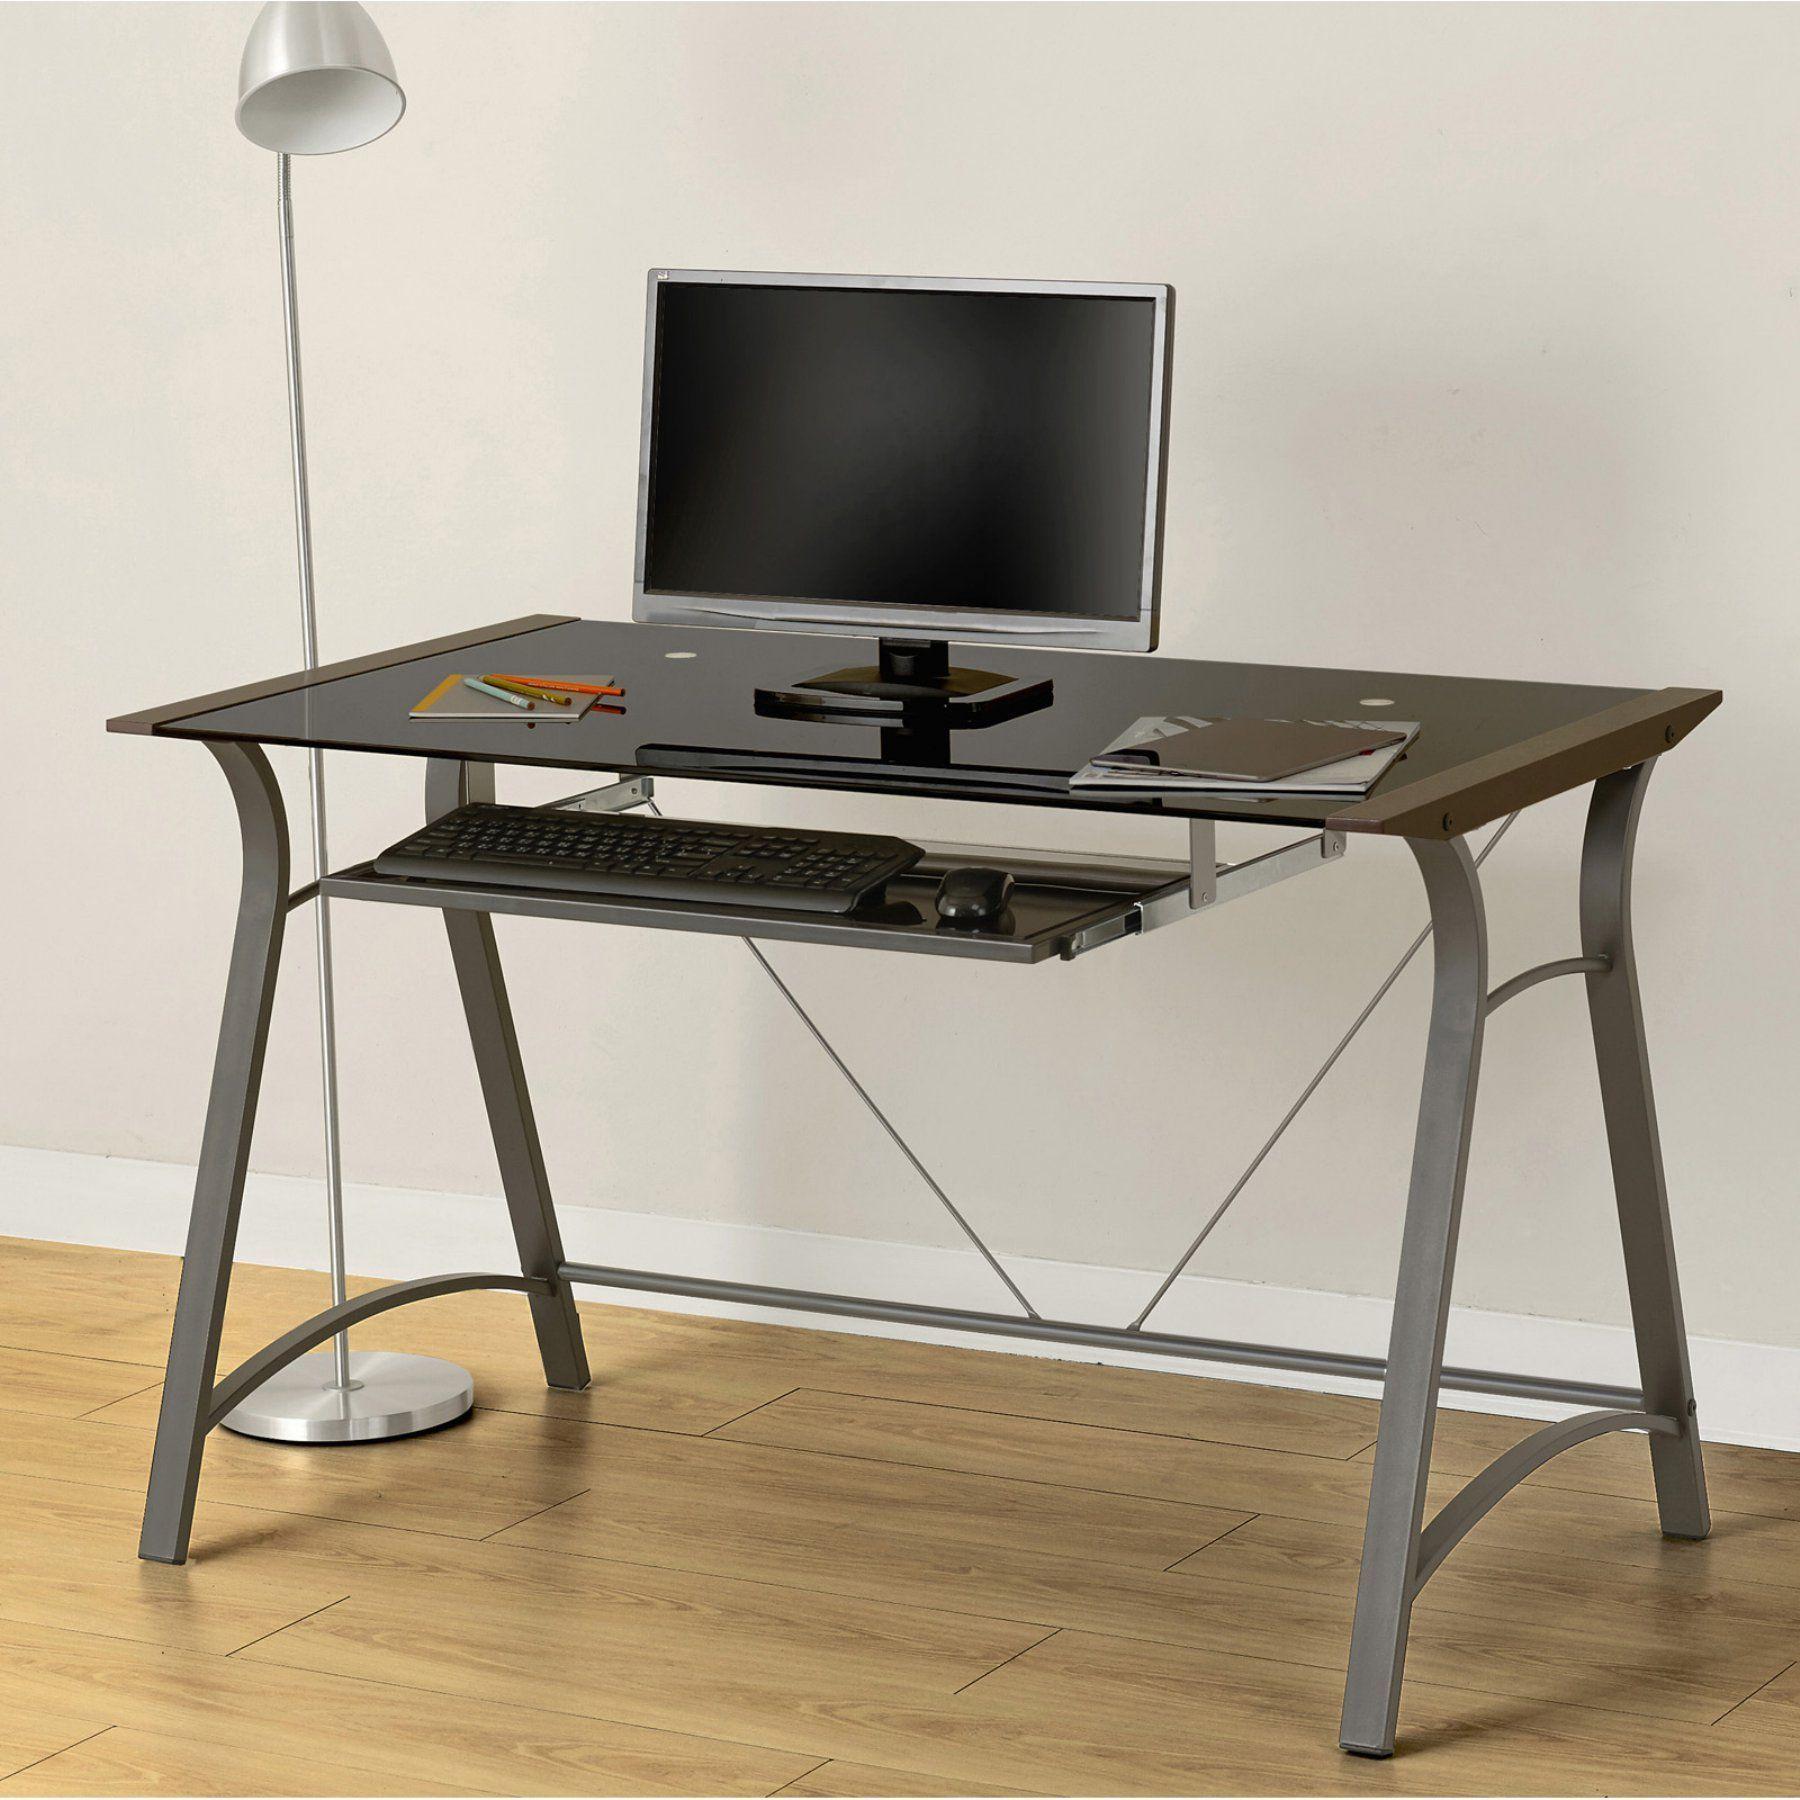 - Urban Haus Beta Modern Computer Desk - UH-4500-B Desk, Modern